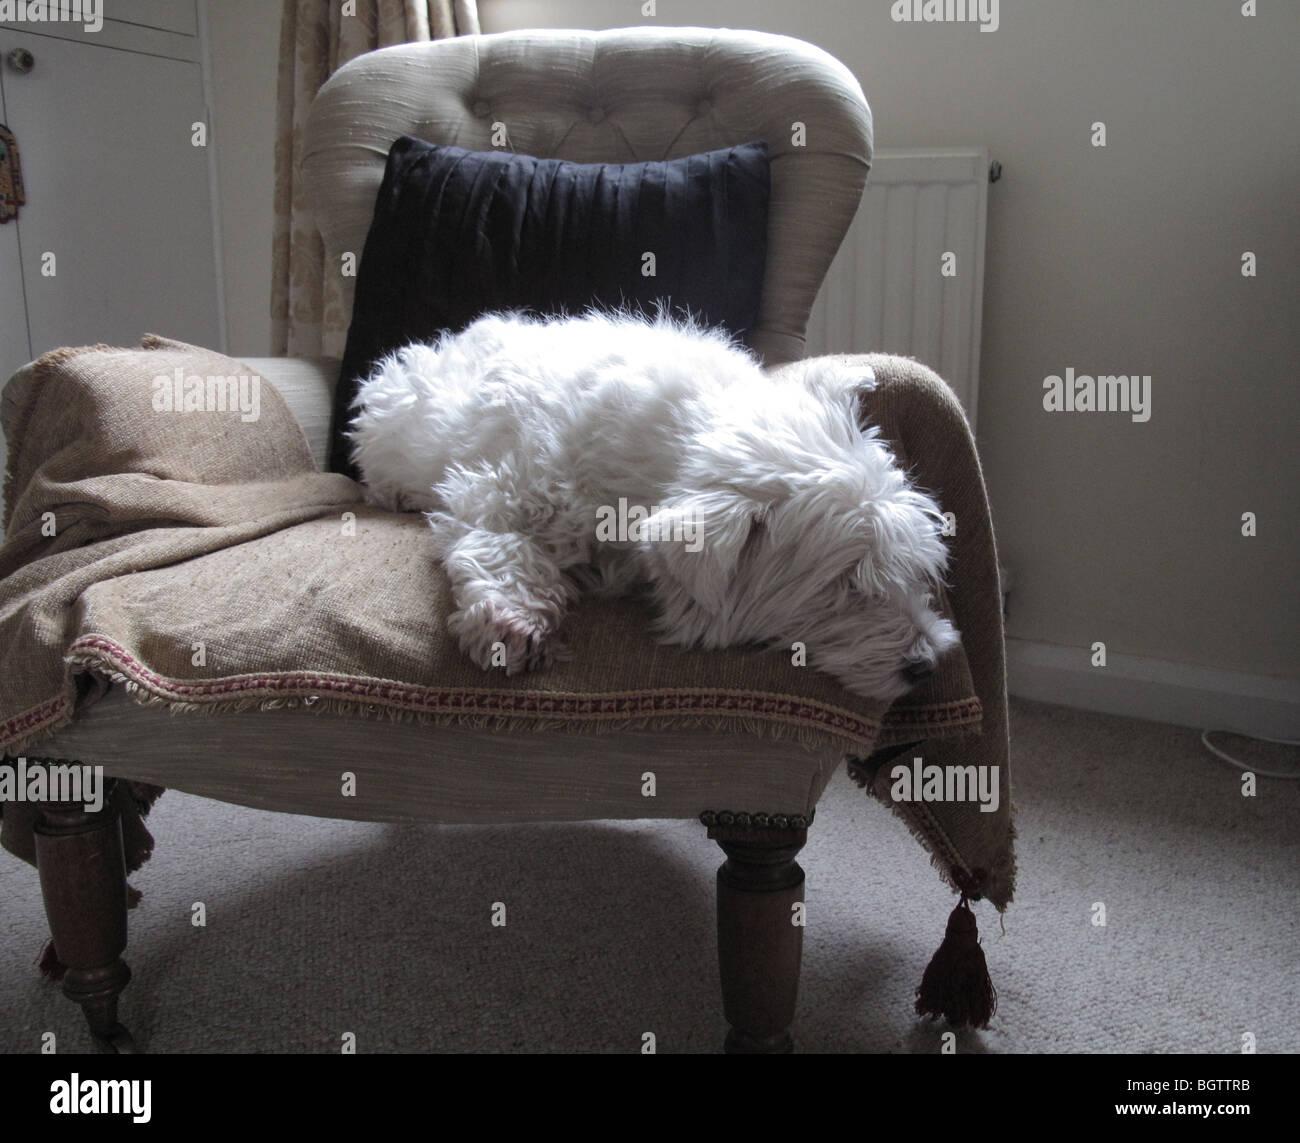 West Highland terrier - Stock Image